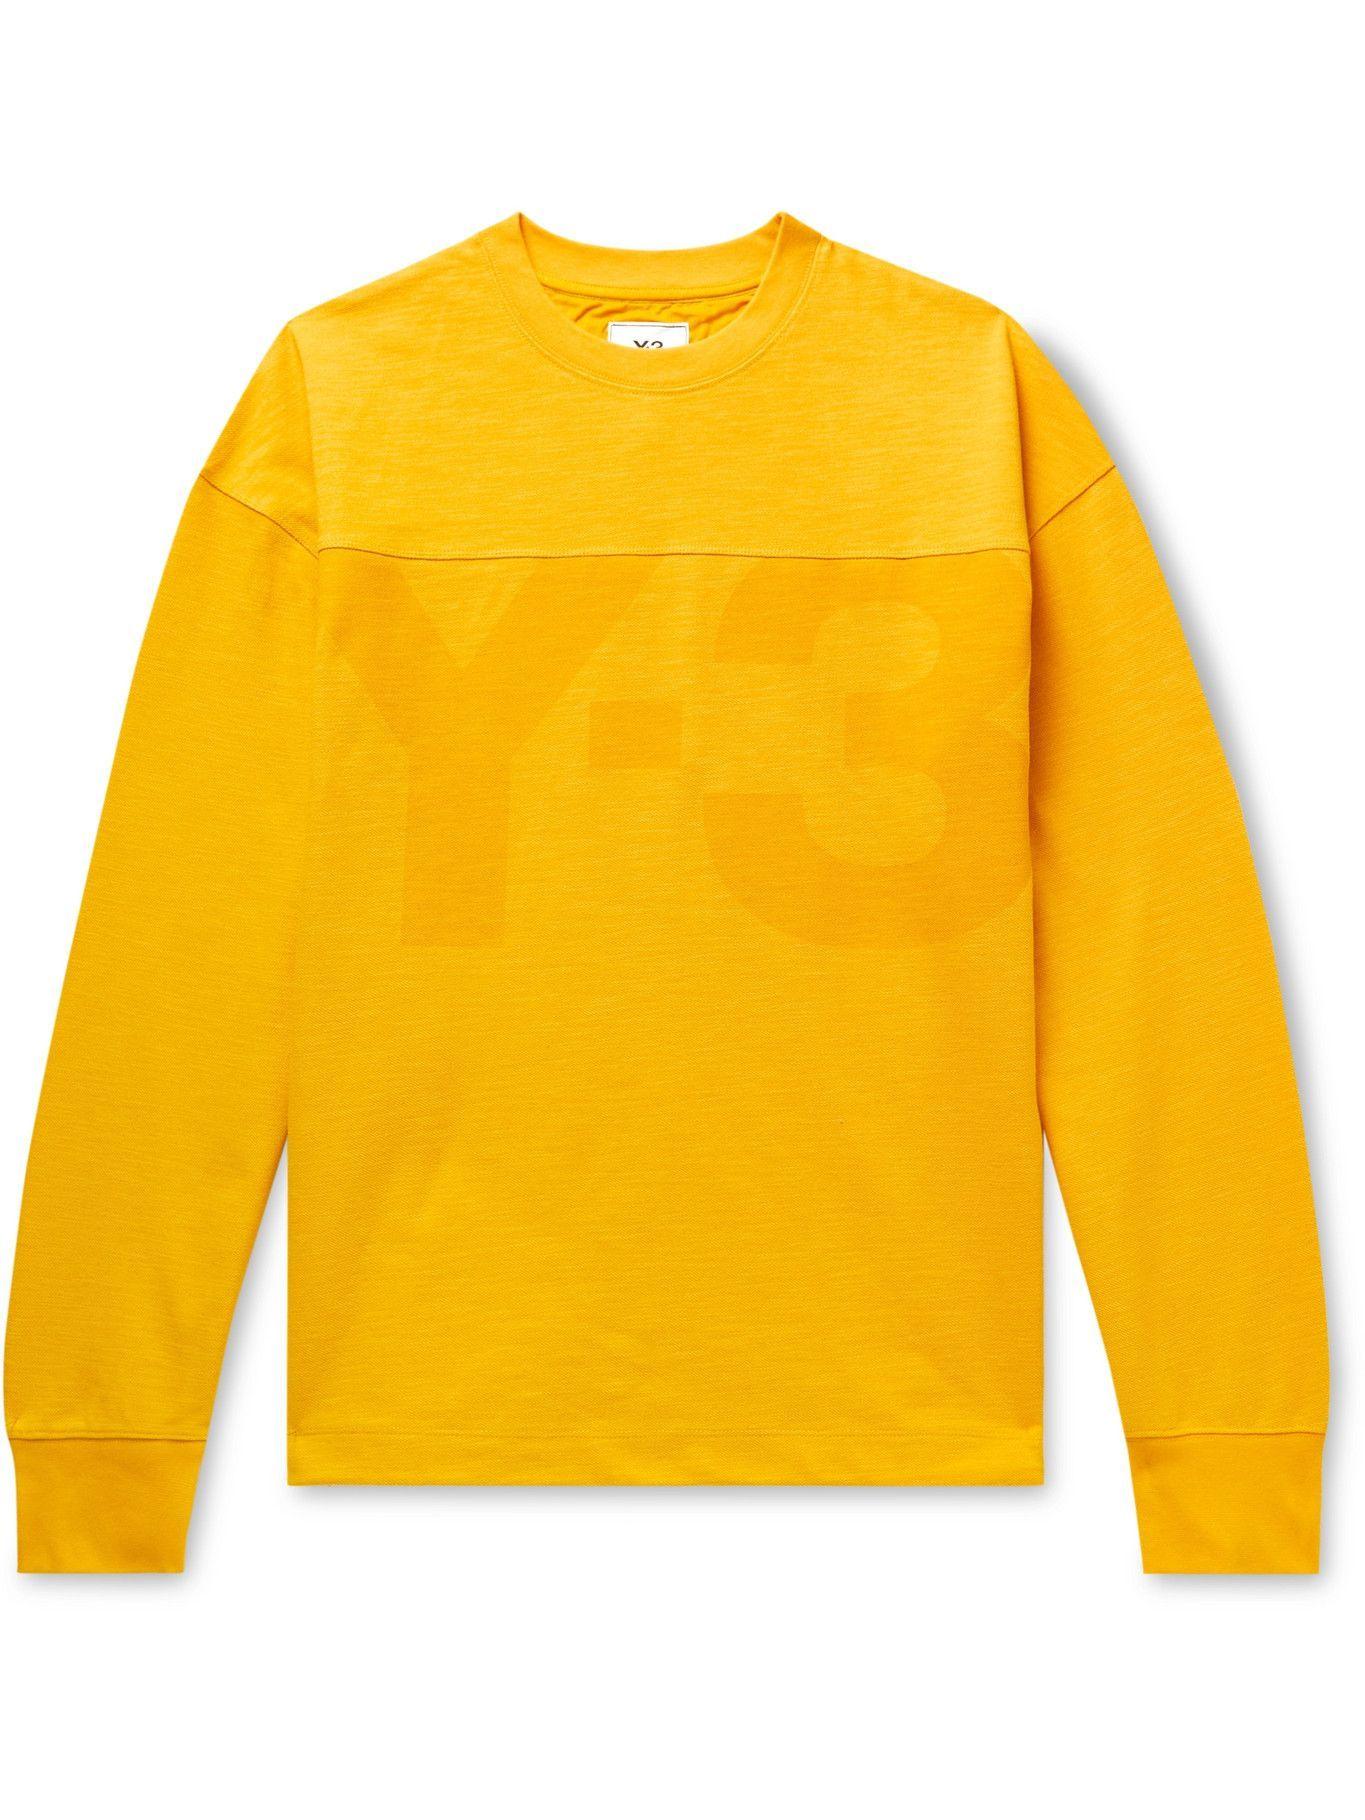 Photo: Y-3 - Oversized Logo-Print Cotton and Linen-Blend Piqué Sweatshirt - Yellow